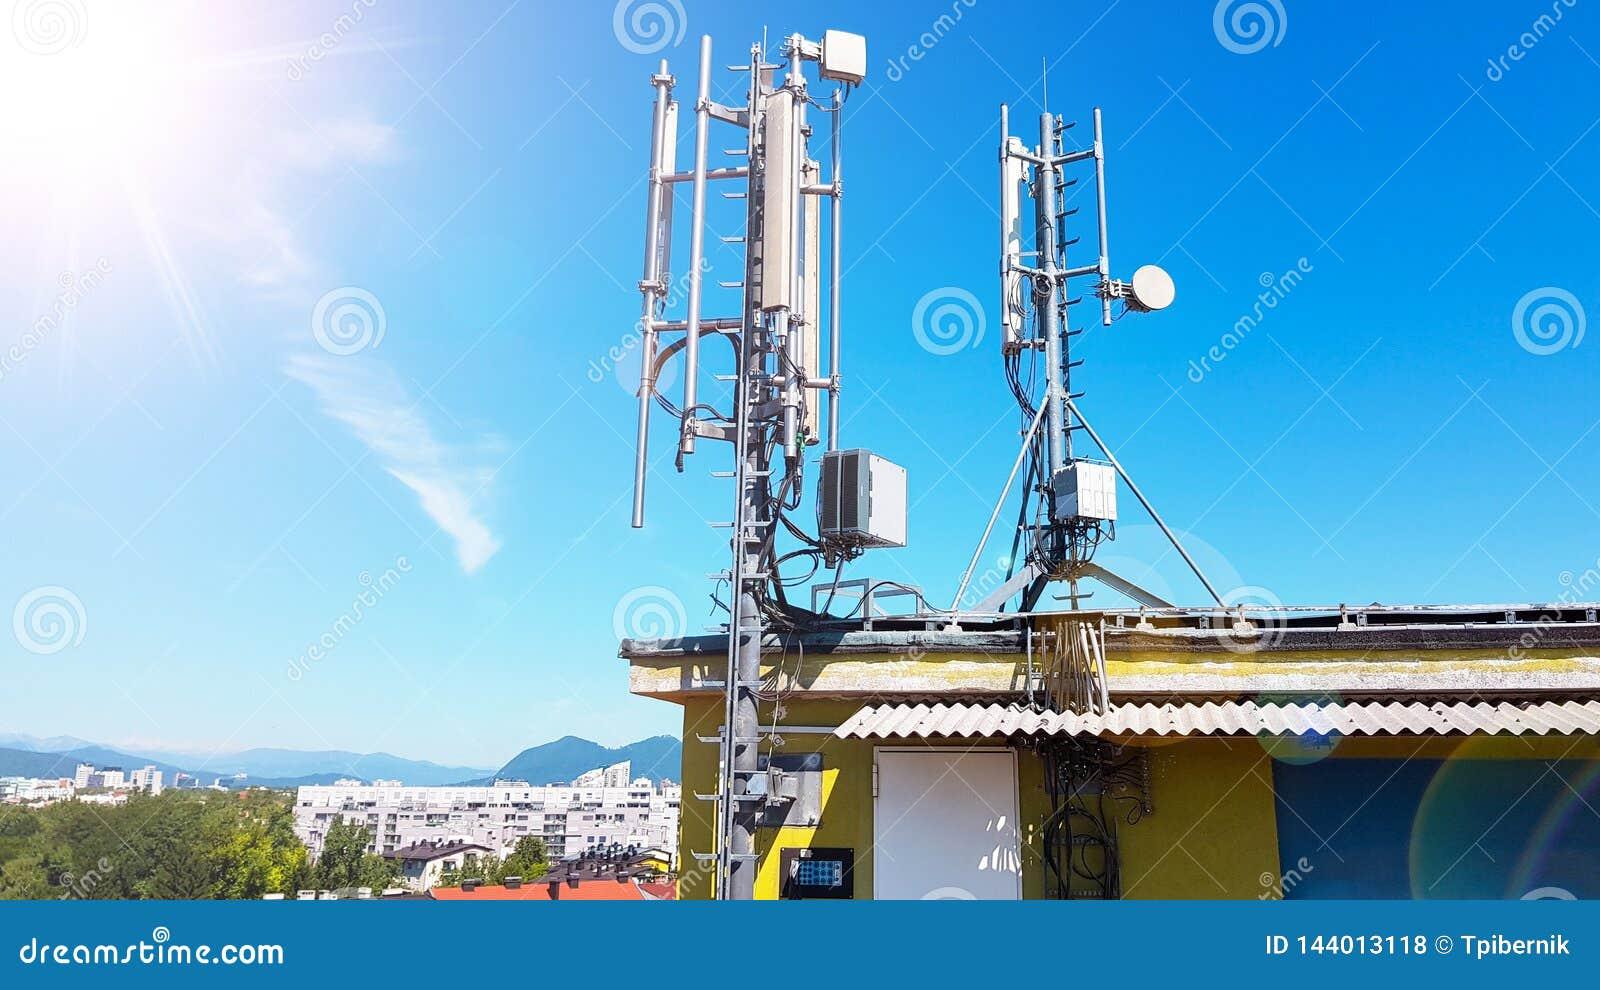 5G έξυπνος σταθμός βάσης κεραιών ραδιοφωνικών δικτύων κινητών τηλεφώνων στον ιστό τηλεπικοινωνιών που ακτινοβολεί το σήμα